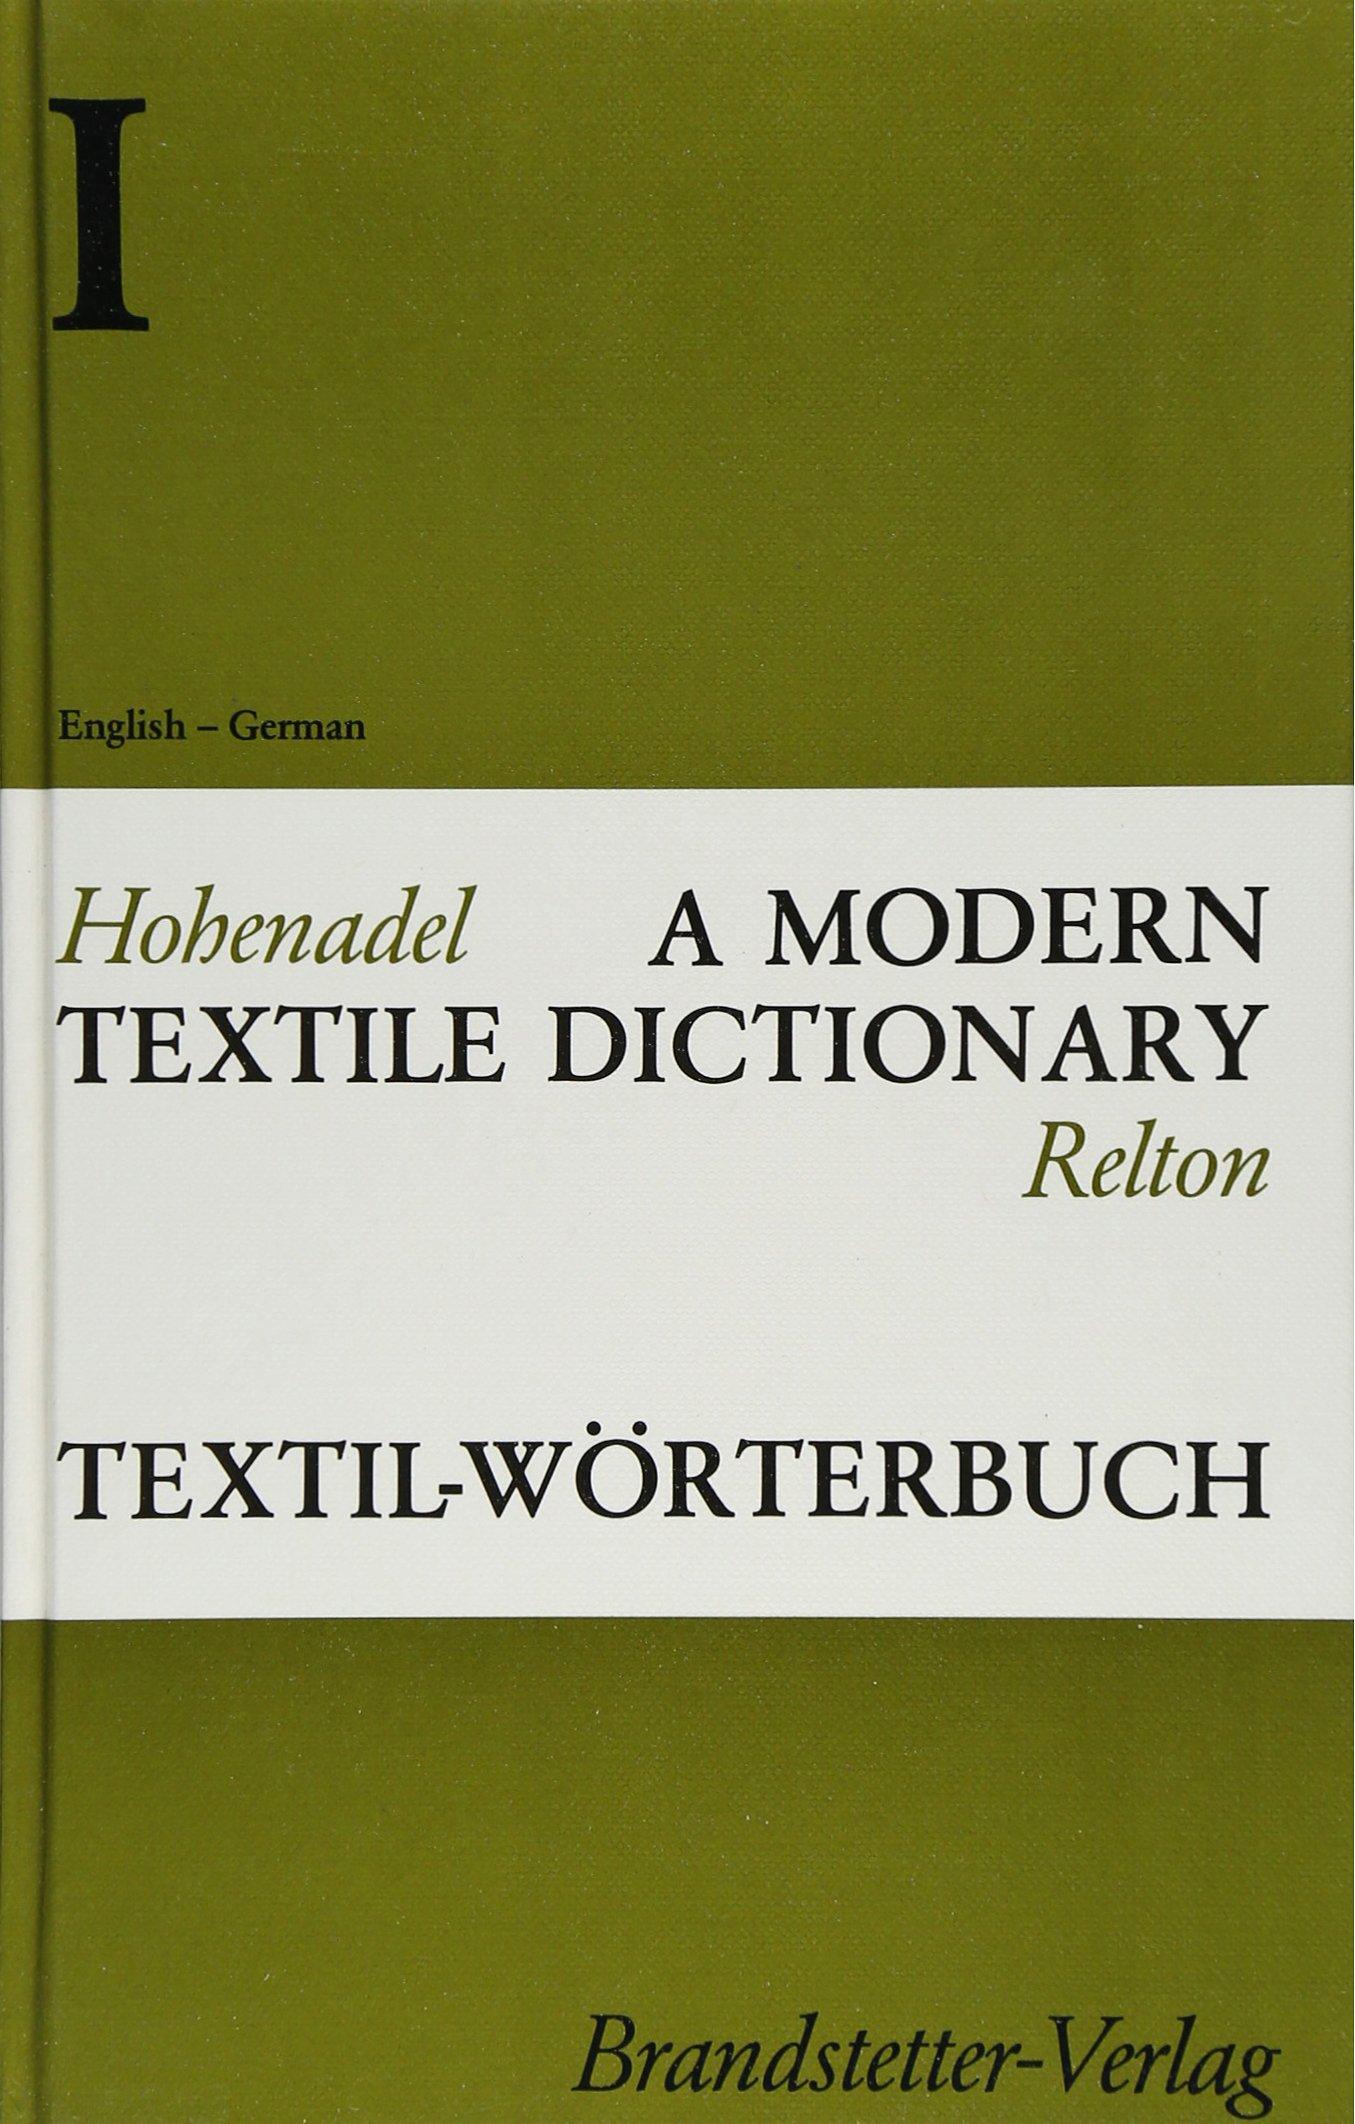 Textil-Wörterbuch. A Modern Textile Dictionary: Textil-Wörterbuch, Bd.1, Englisch-Deutsch (Englisch) Gebundenes Buch – 1991 Paul Hohenadel Jonathan Relton Brandstetter O